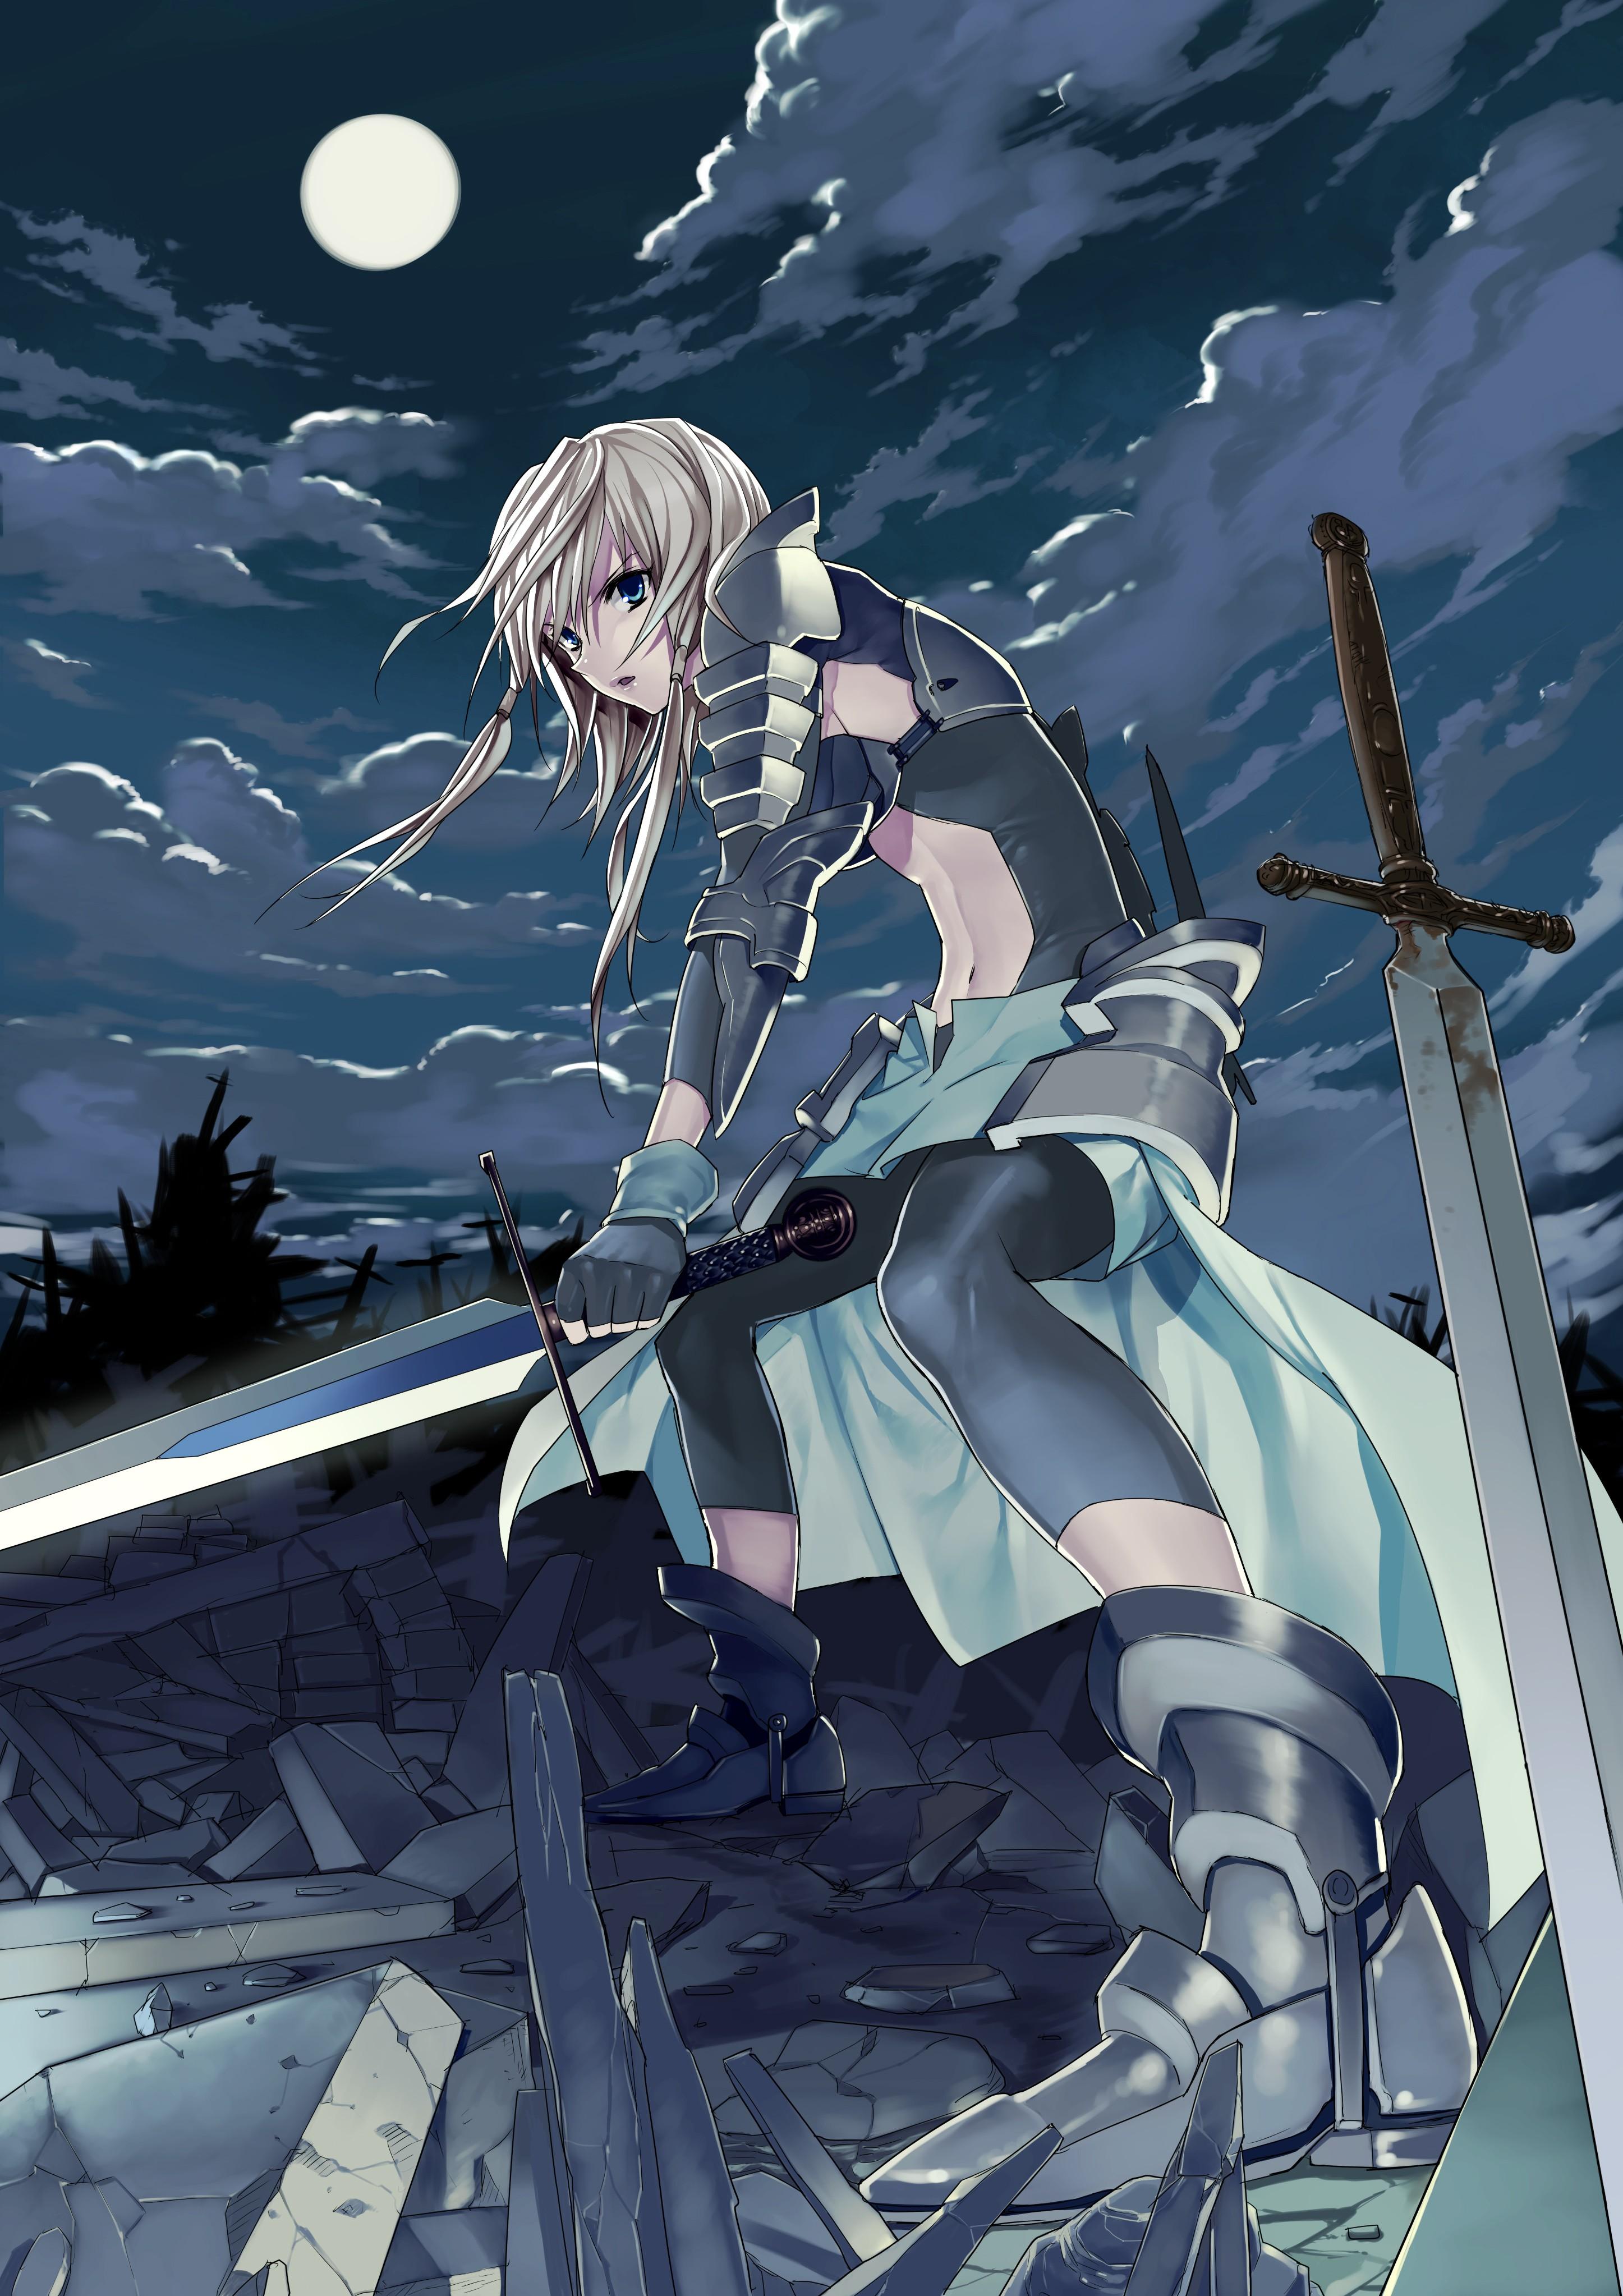 Wallpaper fantasy girl blonde night long hair anime - Anime girl with weapon ...